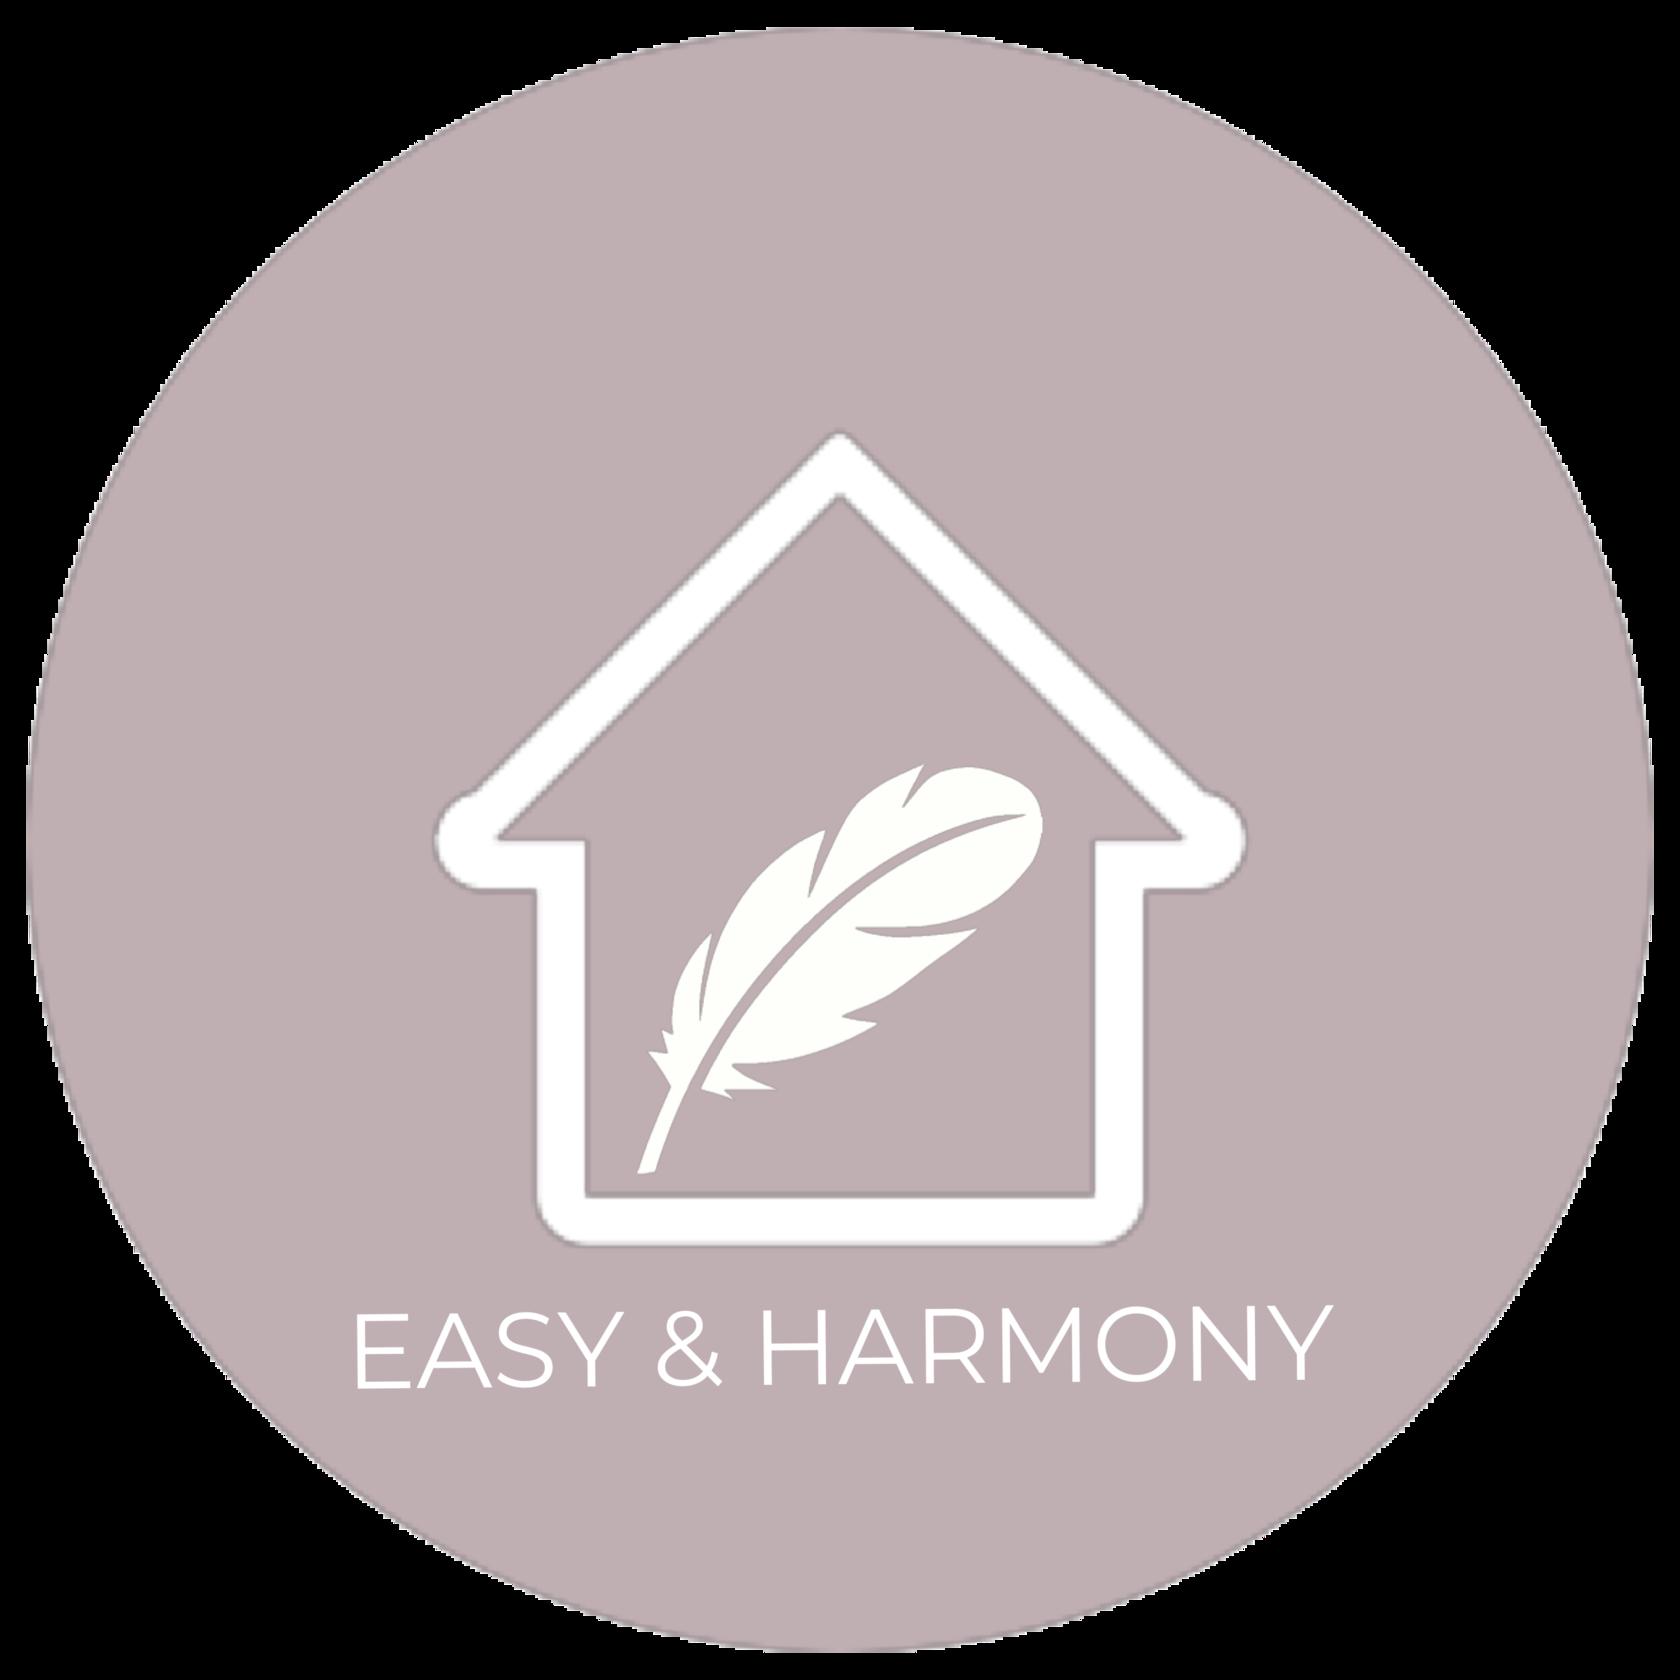 EASY & HARMONY